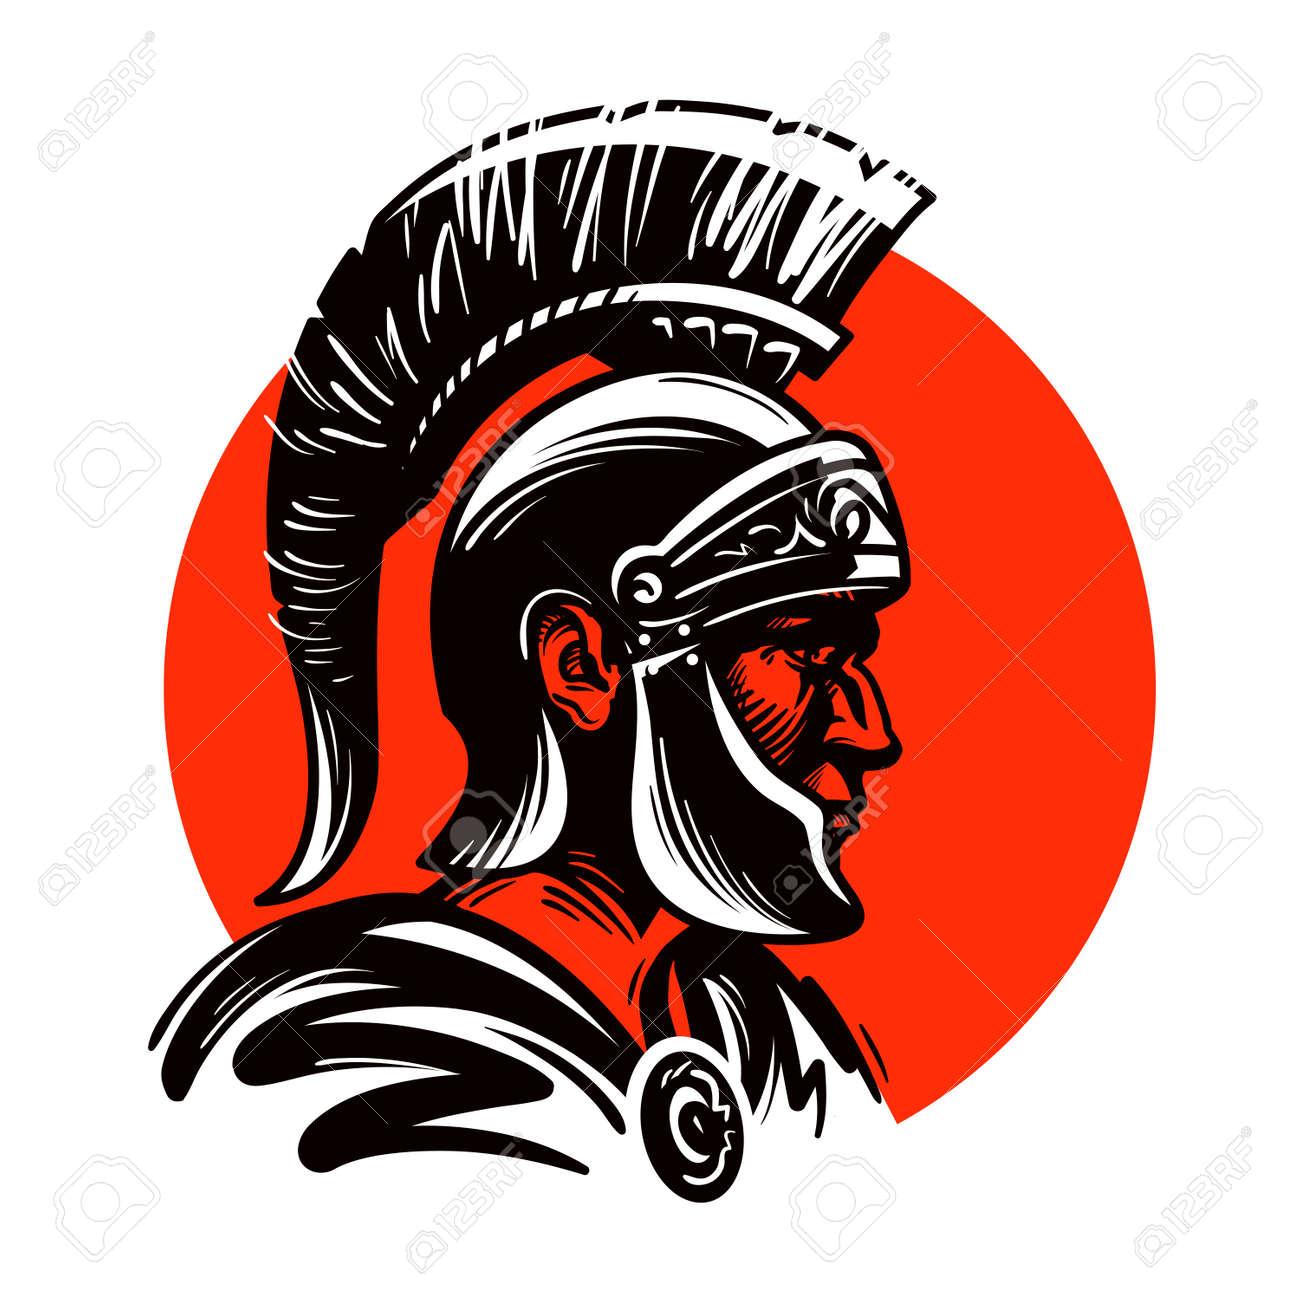 roman soldier or gladiator inside circle vector illustration